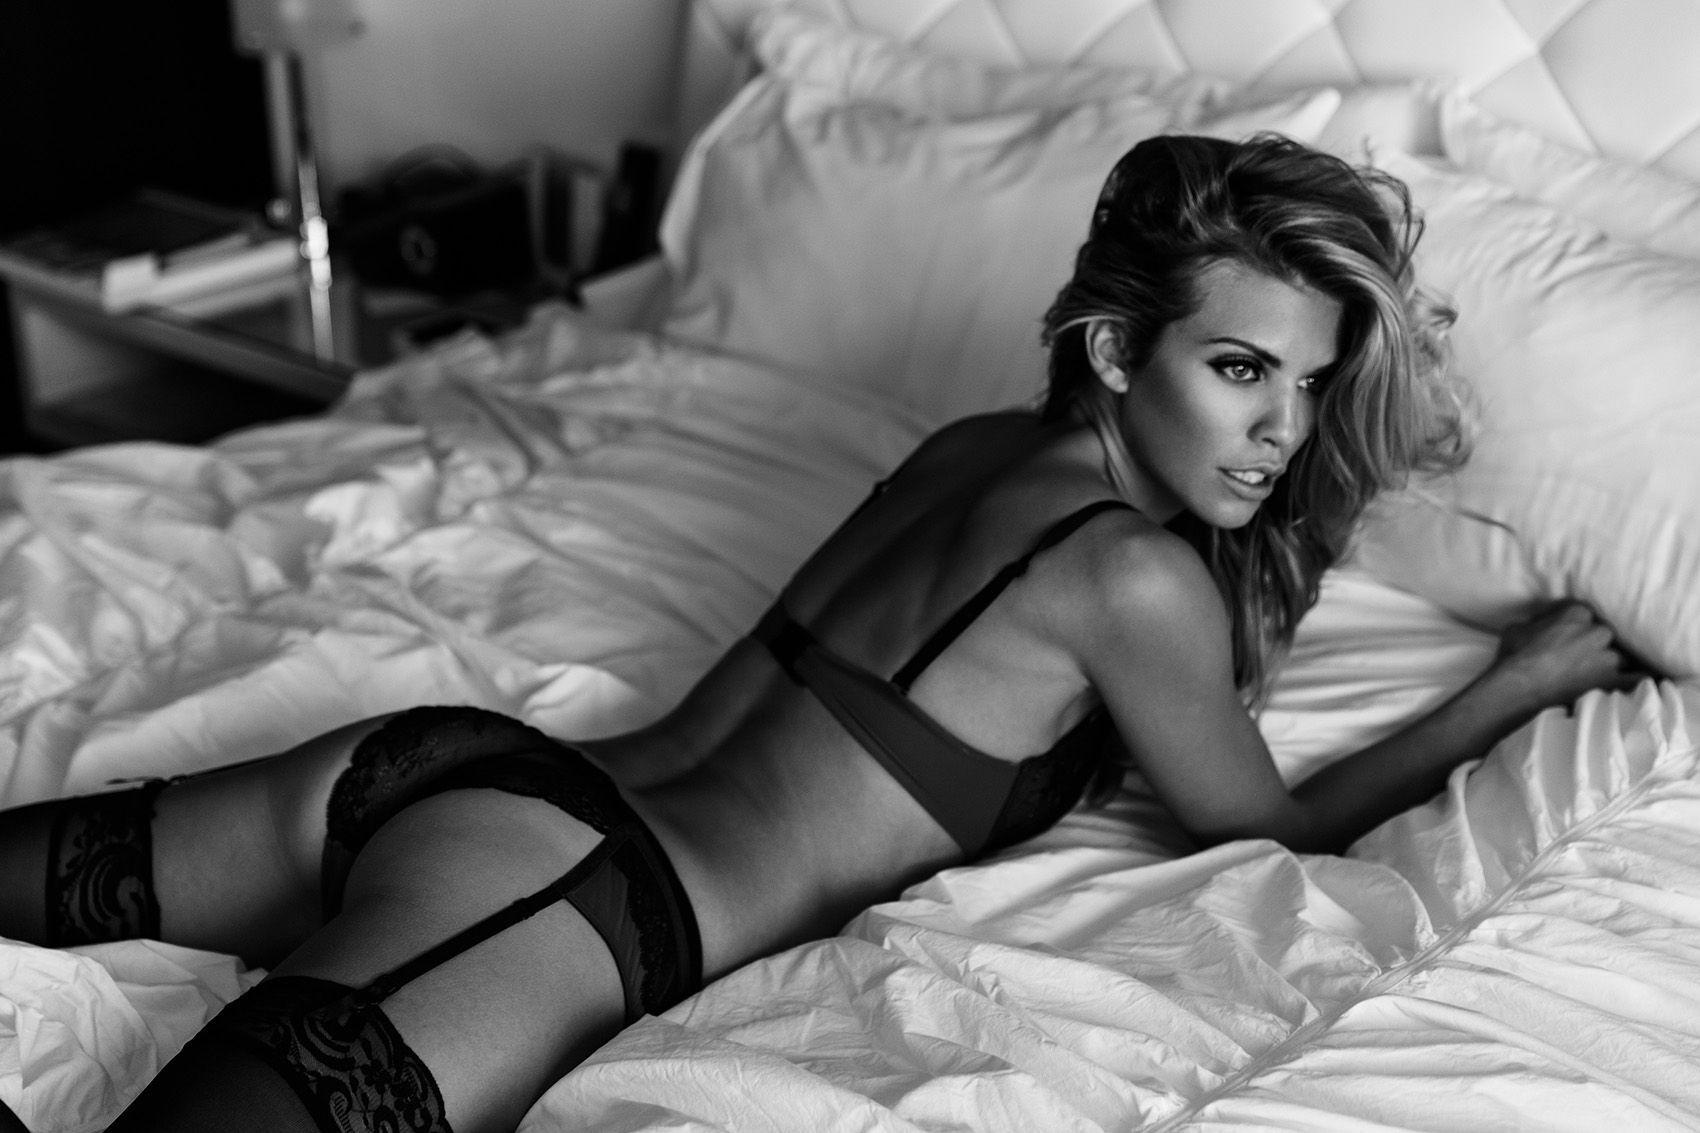 Erotica Anna Lynn McCord naked (21 photos), Topless, Paparazzi, Instagram, lingerie 2018